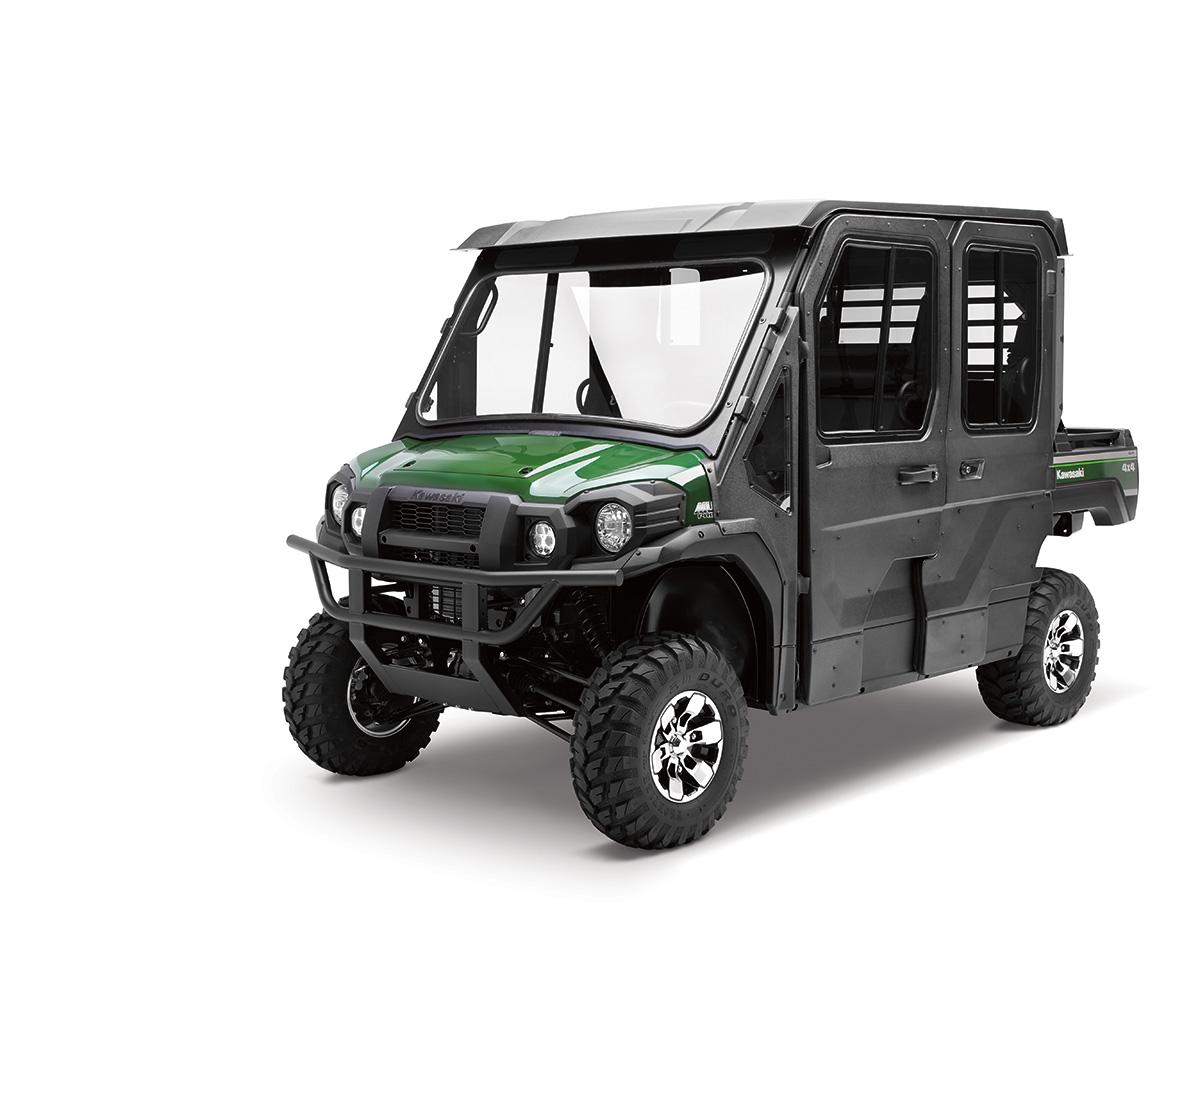 KAWASAKI MULE 4000 4010 4X4 DIESEL CAB ENCLOSURE BLACK DOORS